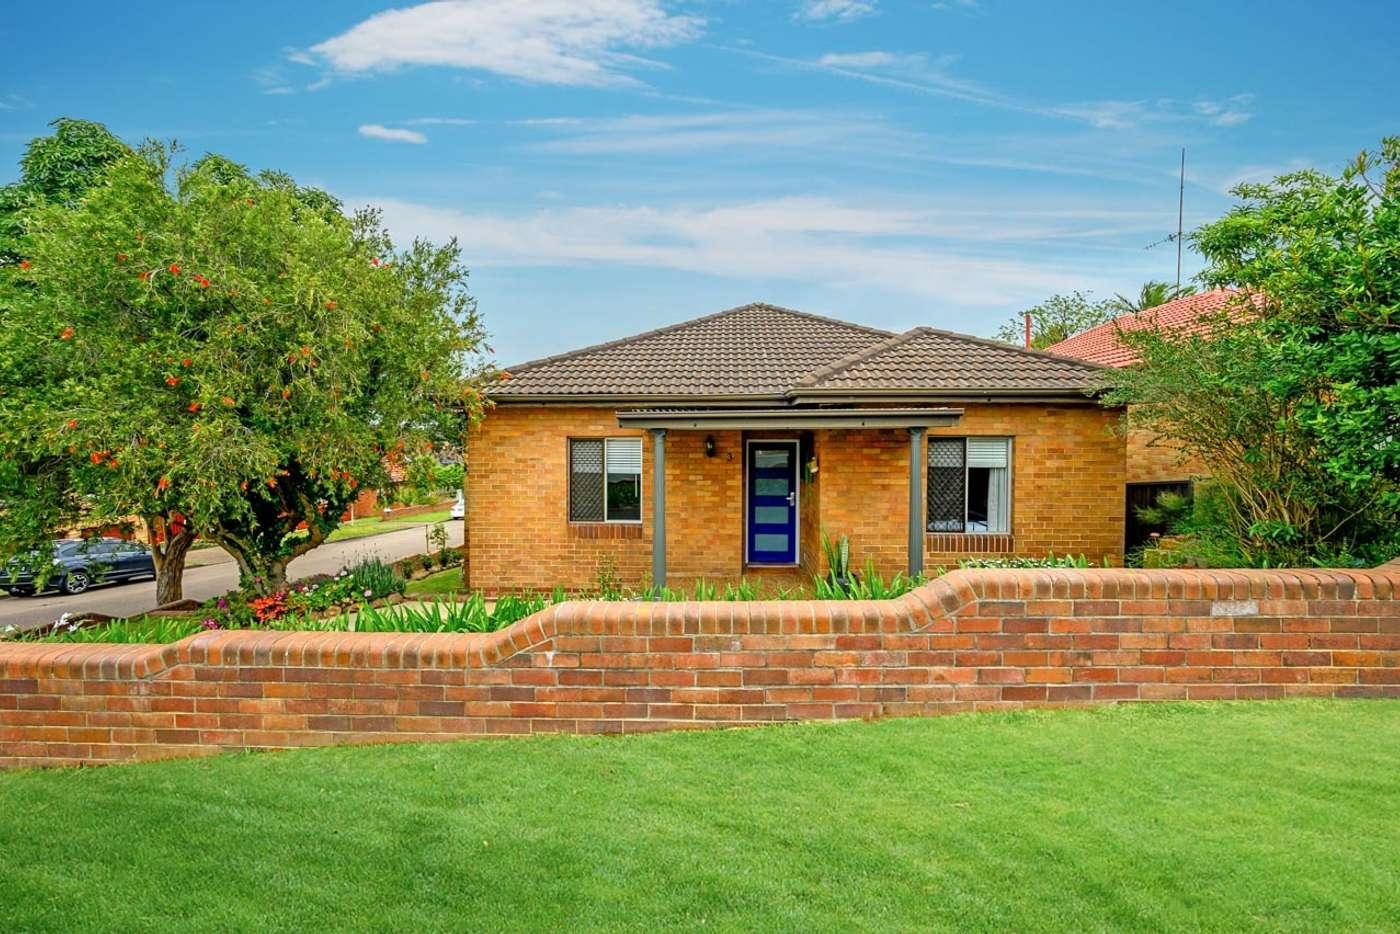 Main view of Homely house listing, 3 Delando Street, Waratah NSW 2298